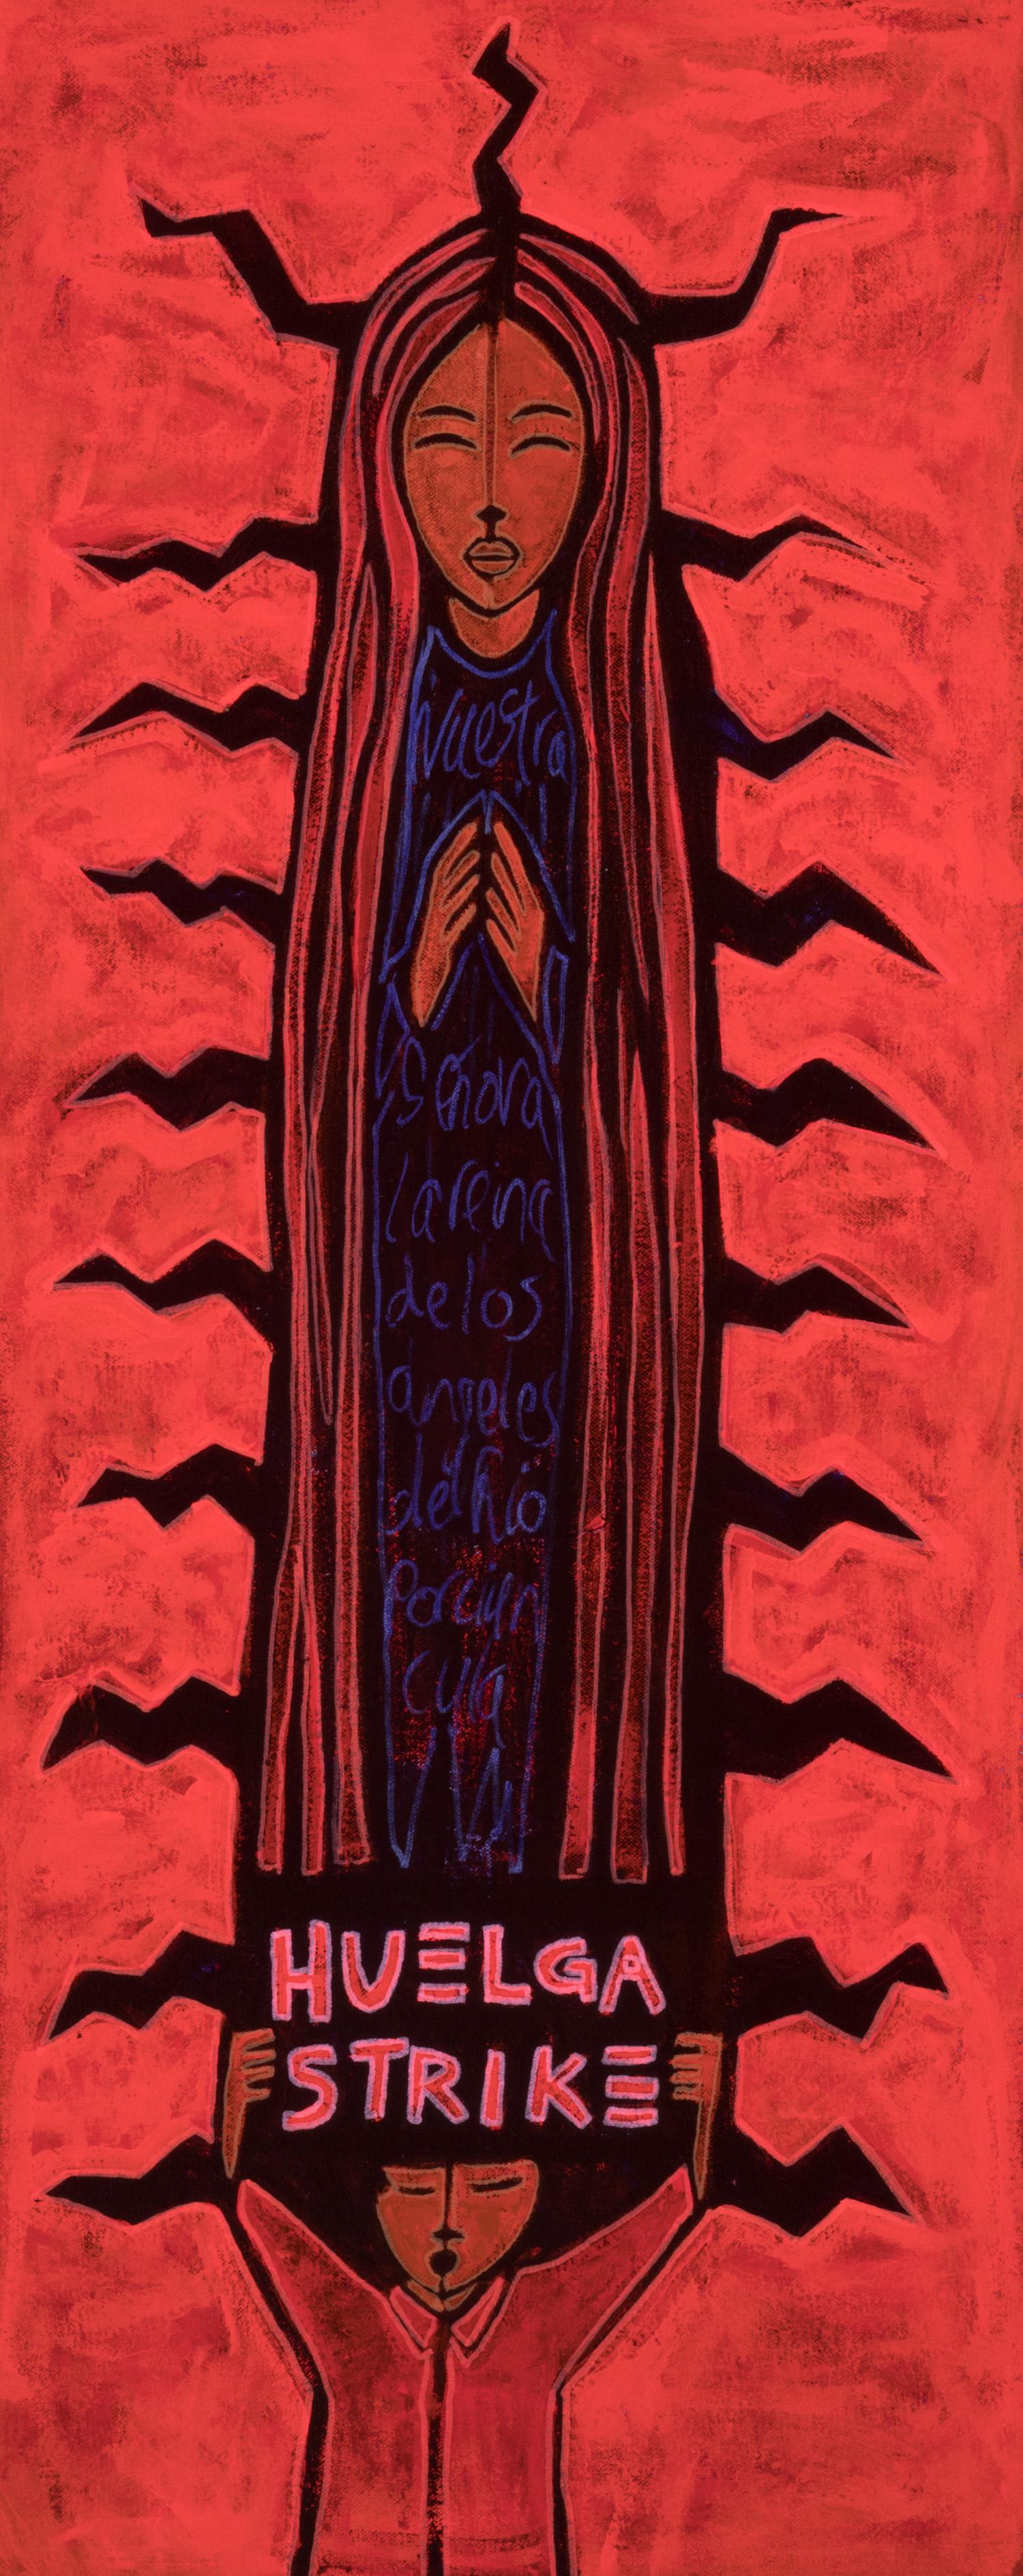 huelga lupe, 2019, mixed media on canvas, 12x30